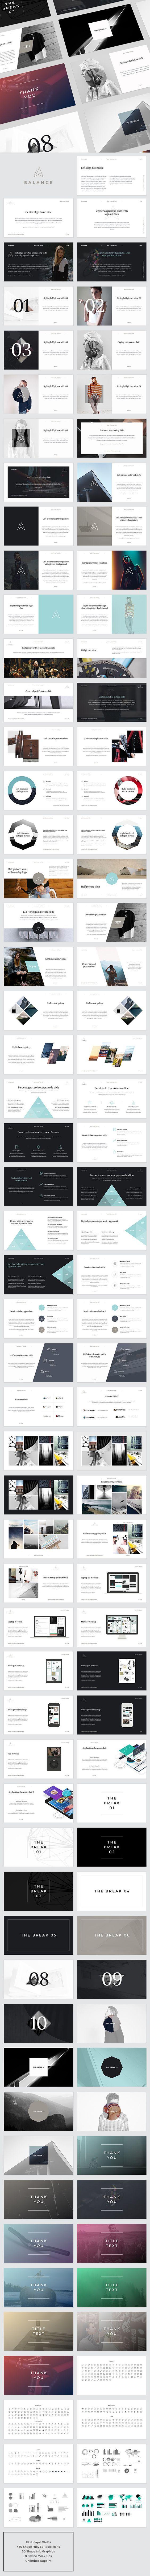 BALANCE PowerPoint Presentation Template #design #slides Download: http://graphicriver.net/item/balance-powerpoint-presentation/14417275?ref=ksioks: